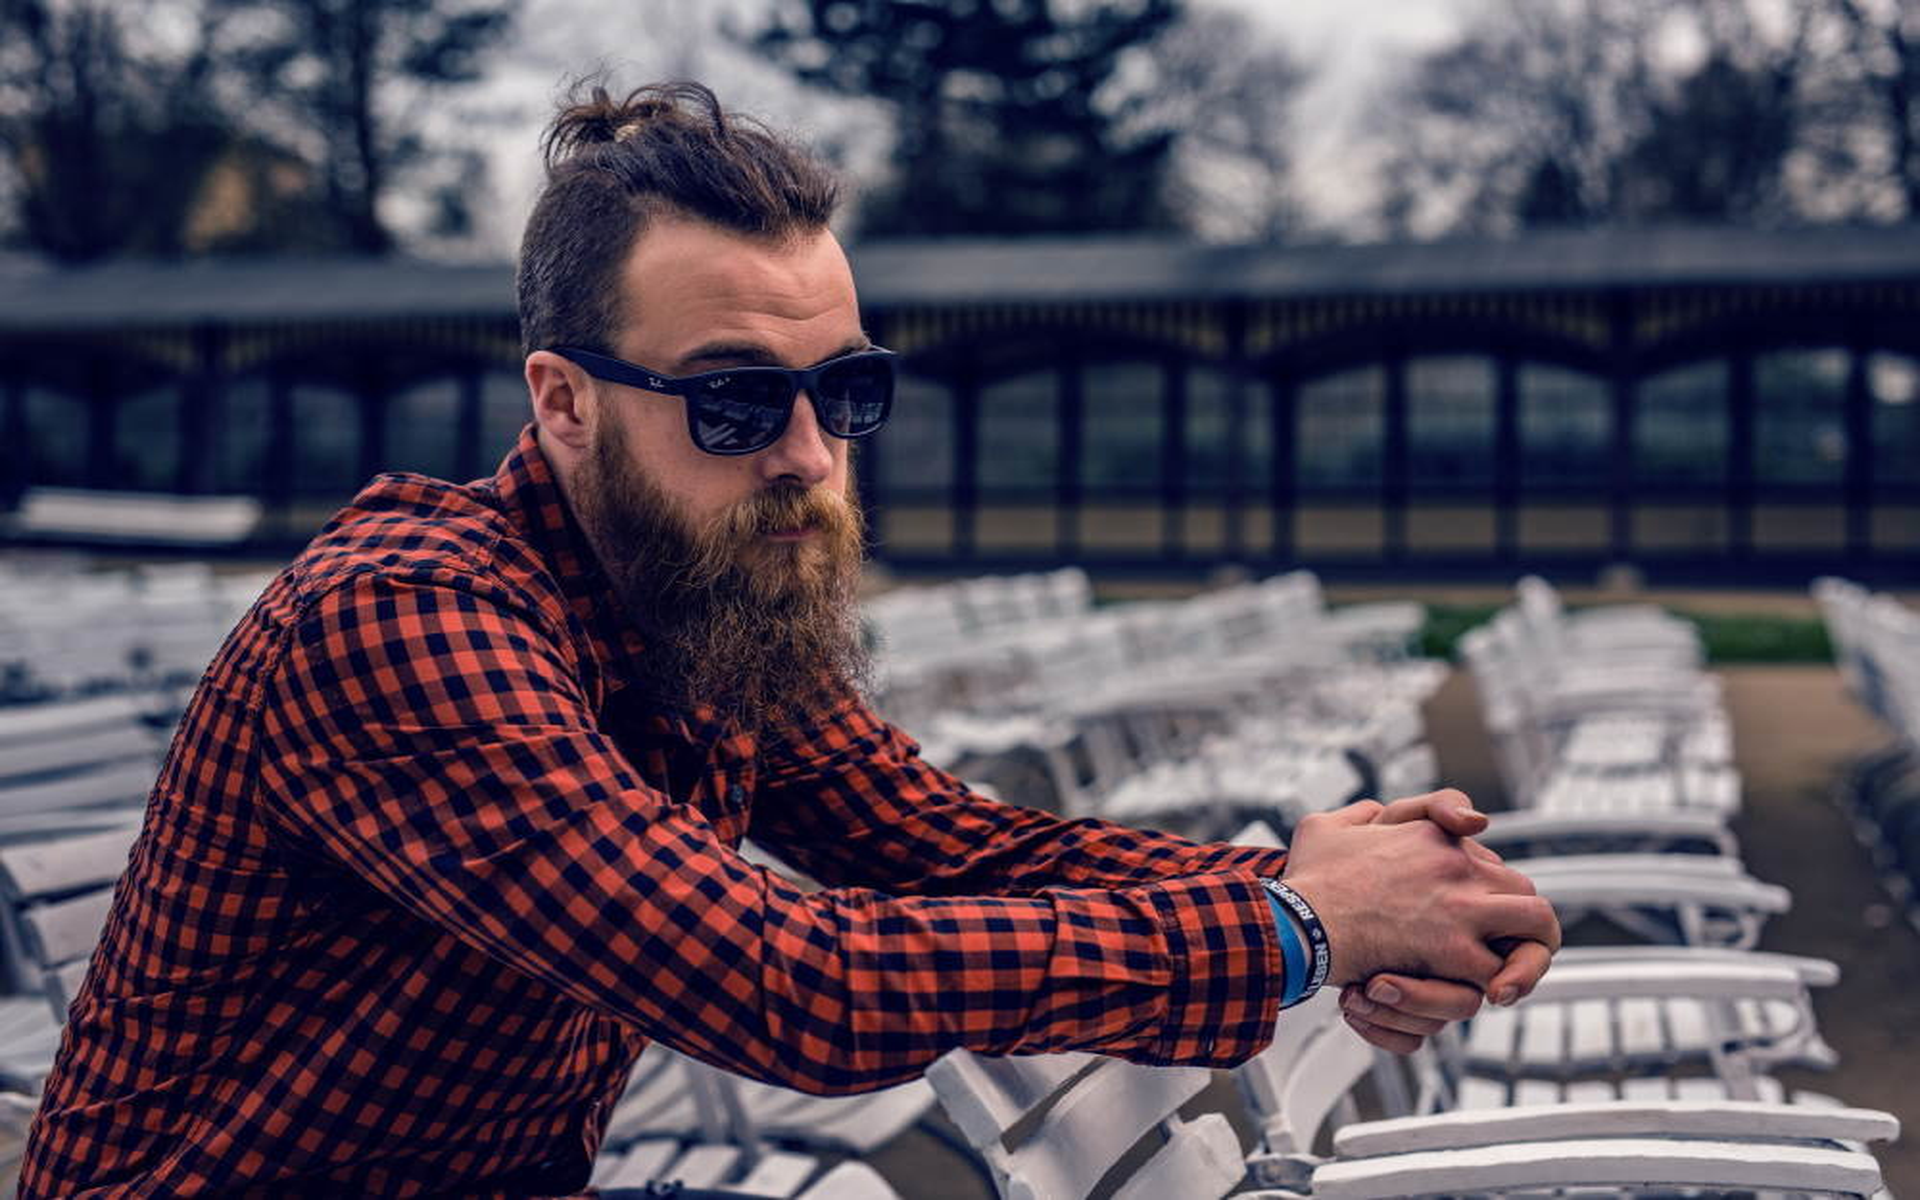 Der ultimative Hipster-Guide - Daran erkennst du einen Hipster - Der ultimative Hipster-Guide